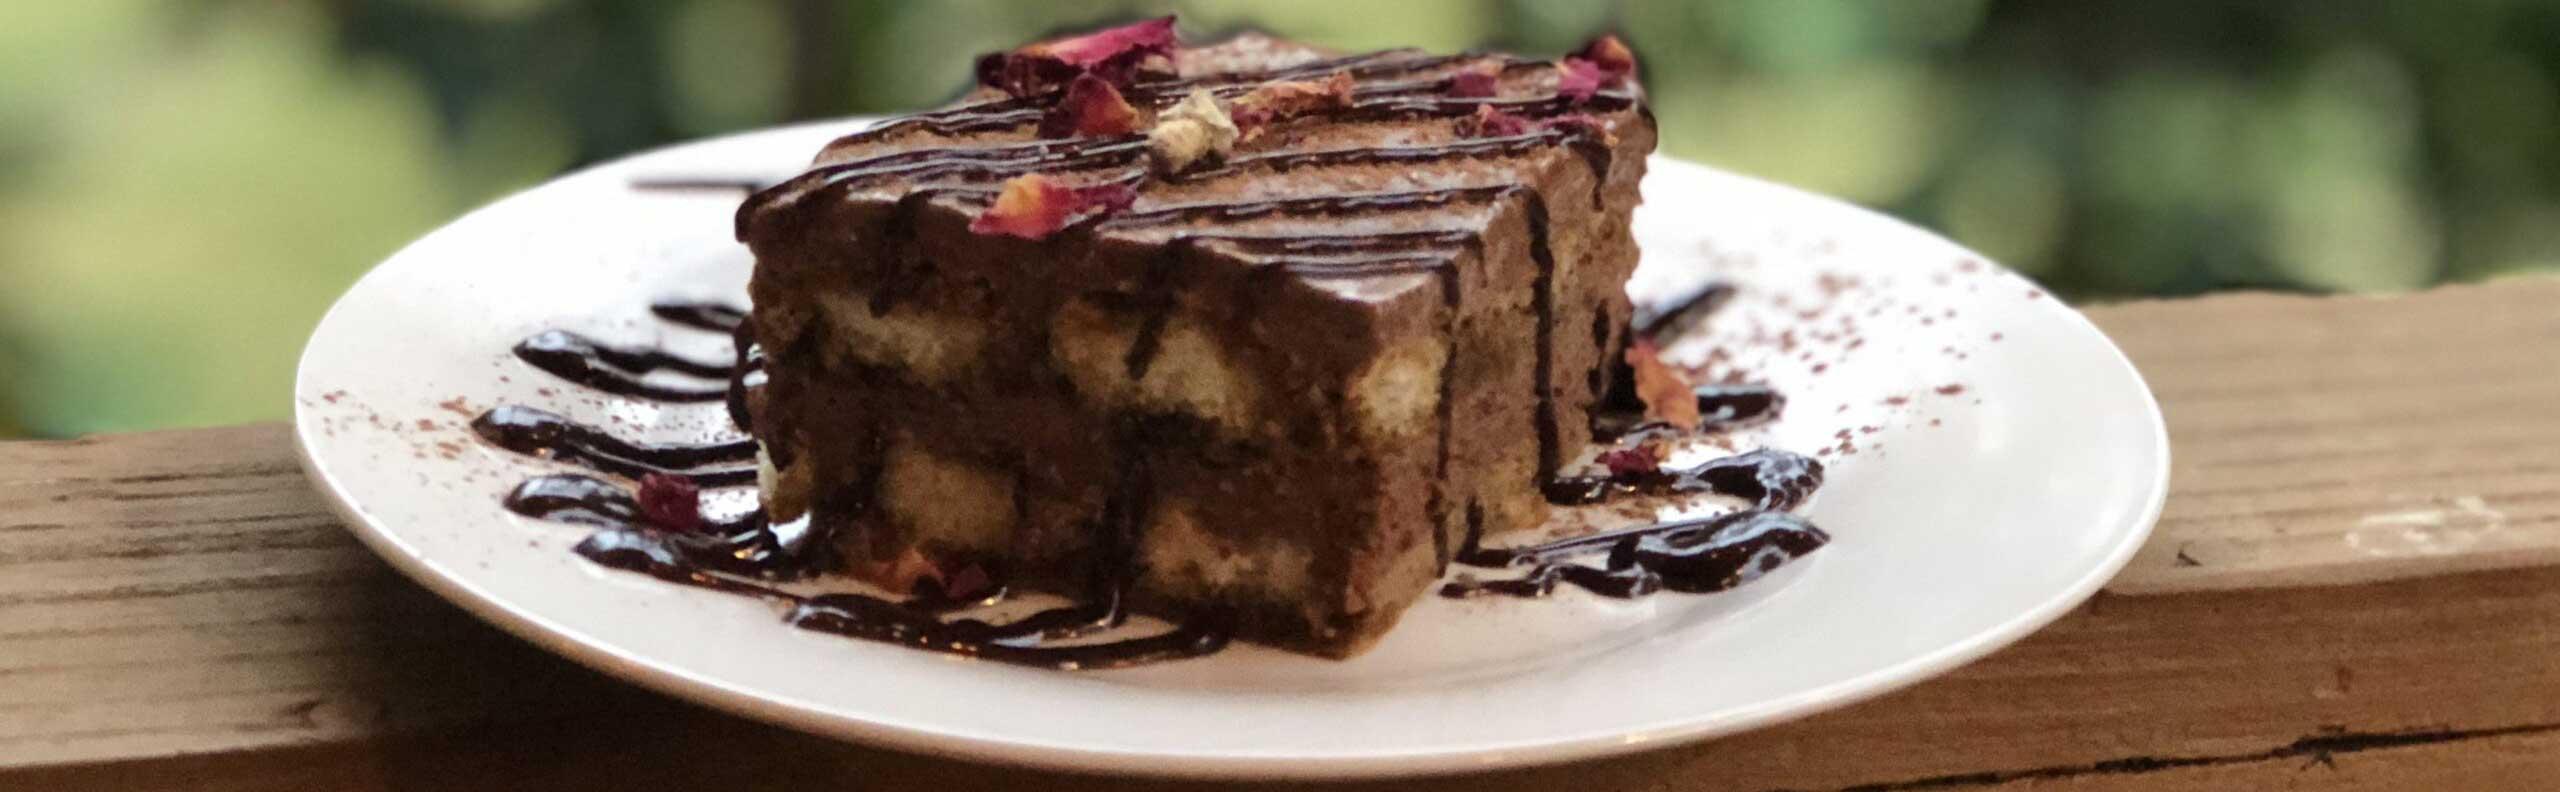 Double Chocolate Tiramisu with Balsamic Sauce